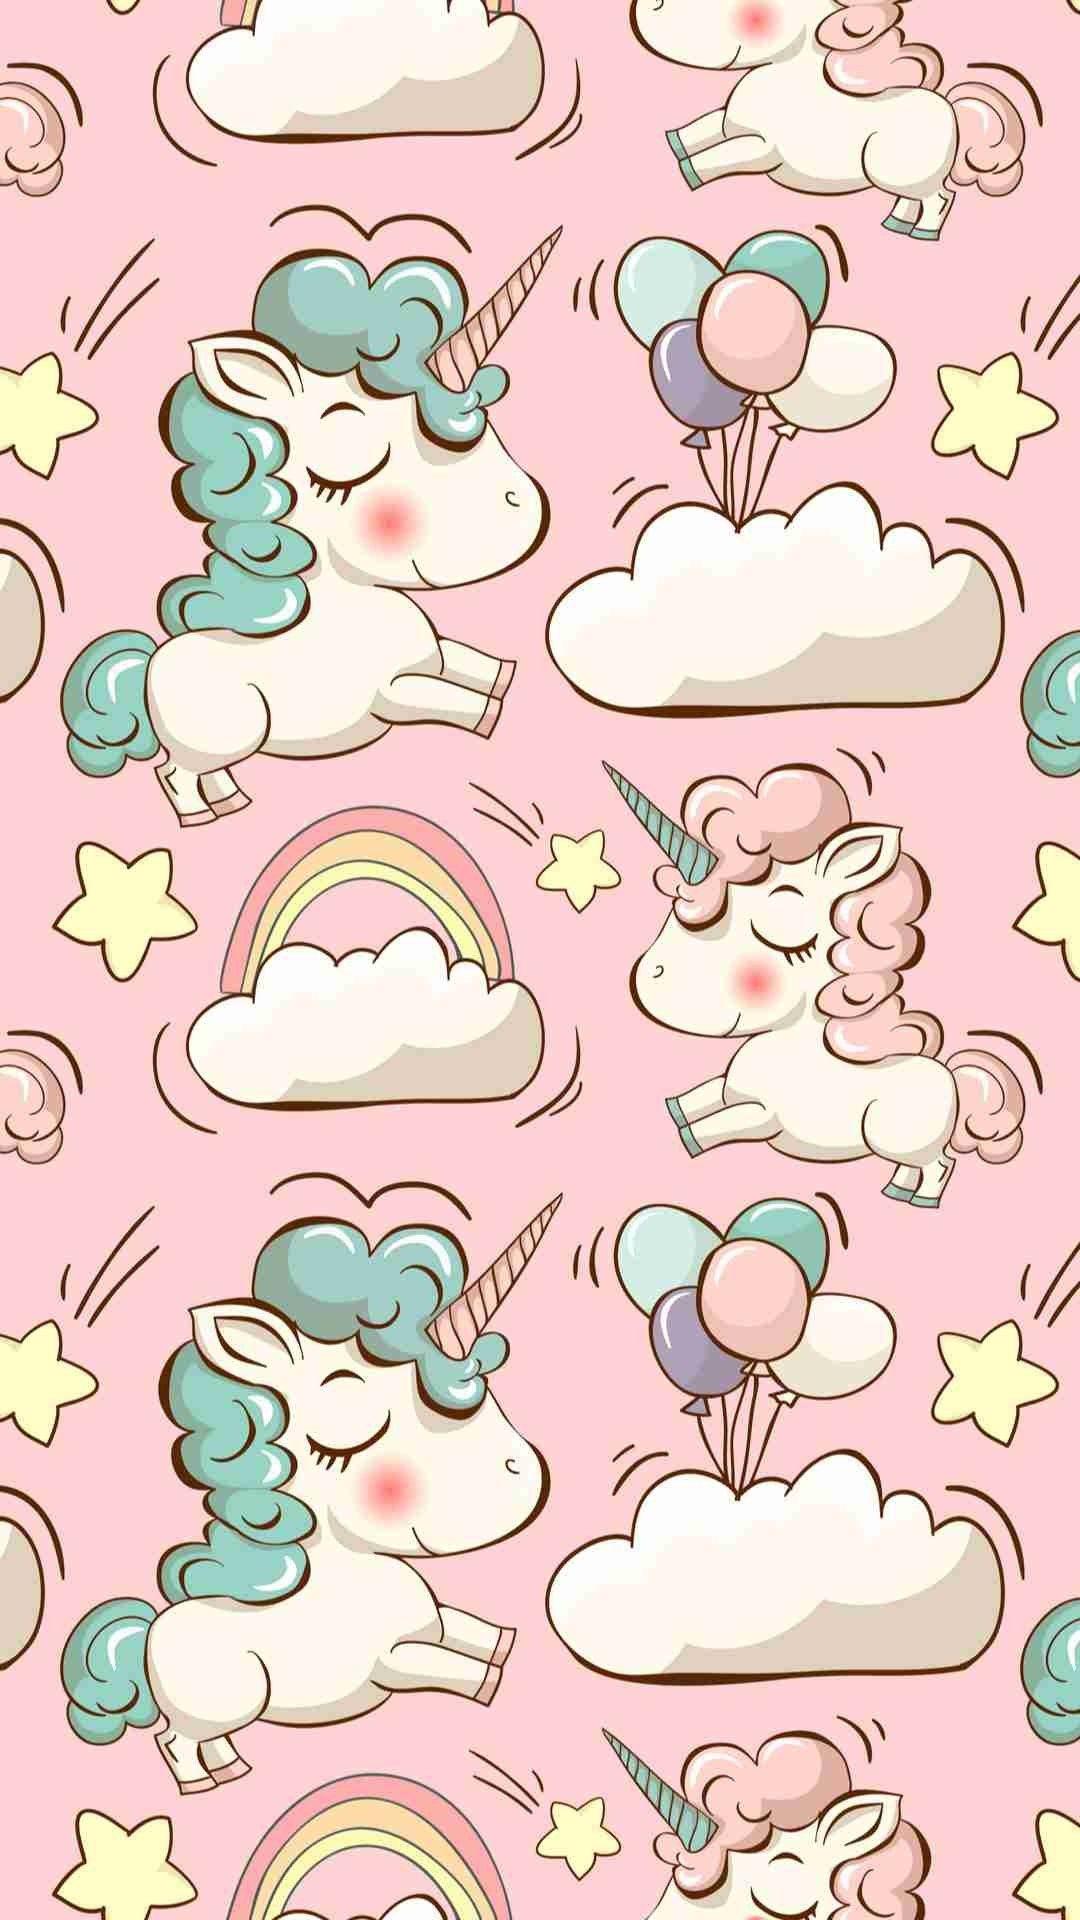 Pin by Cole Stubbs on I ♡ Unicorns Unicorn wallpaper